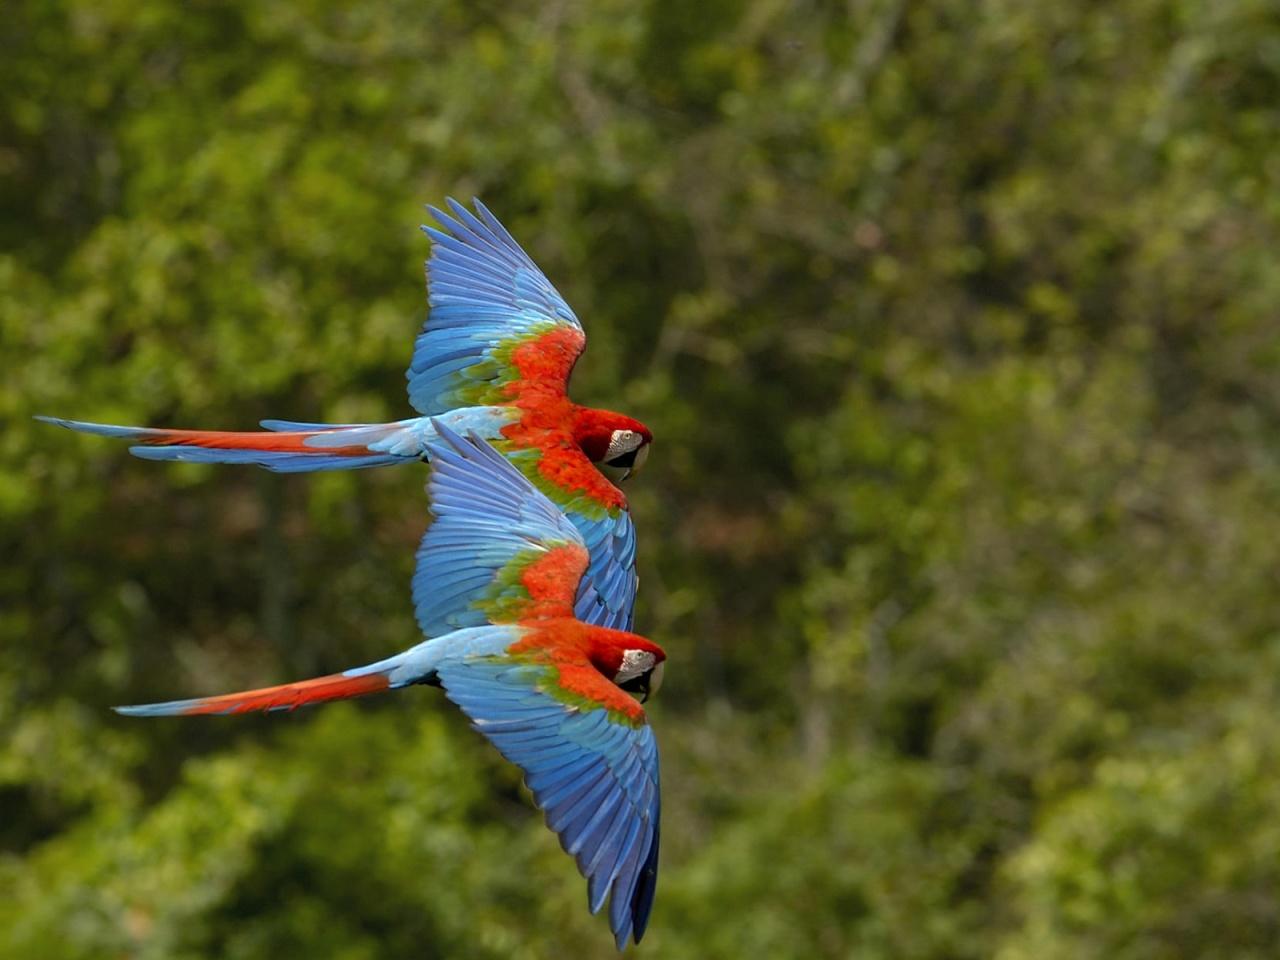 Wallpaper Gallery Love Bird Wallpaper: Wildlife Of The World: Beautiful Parrot Wallpapers 2012